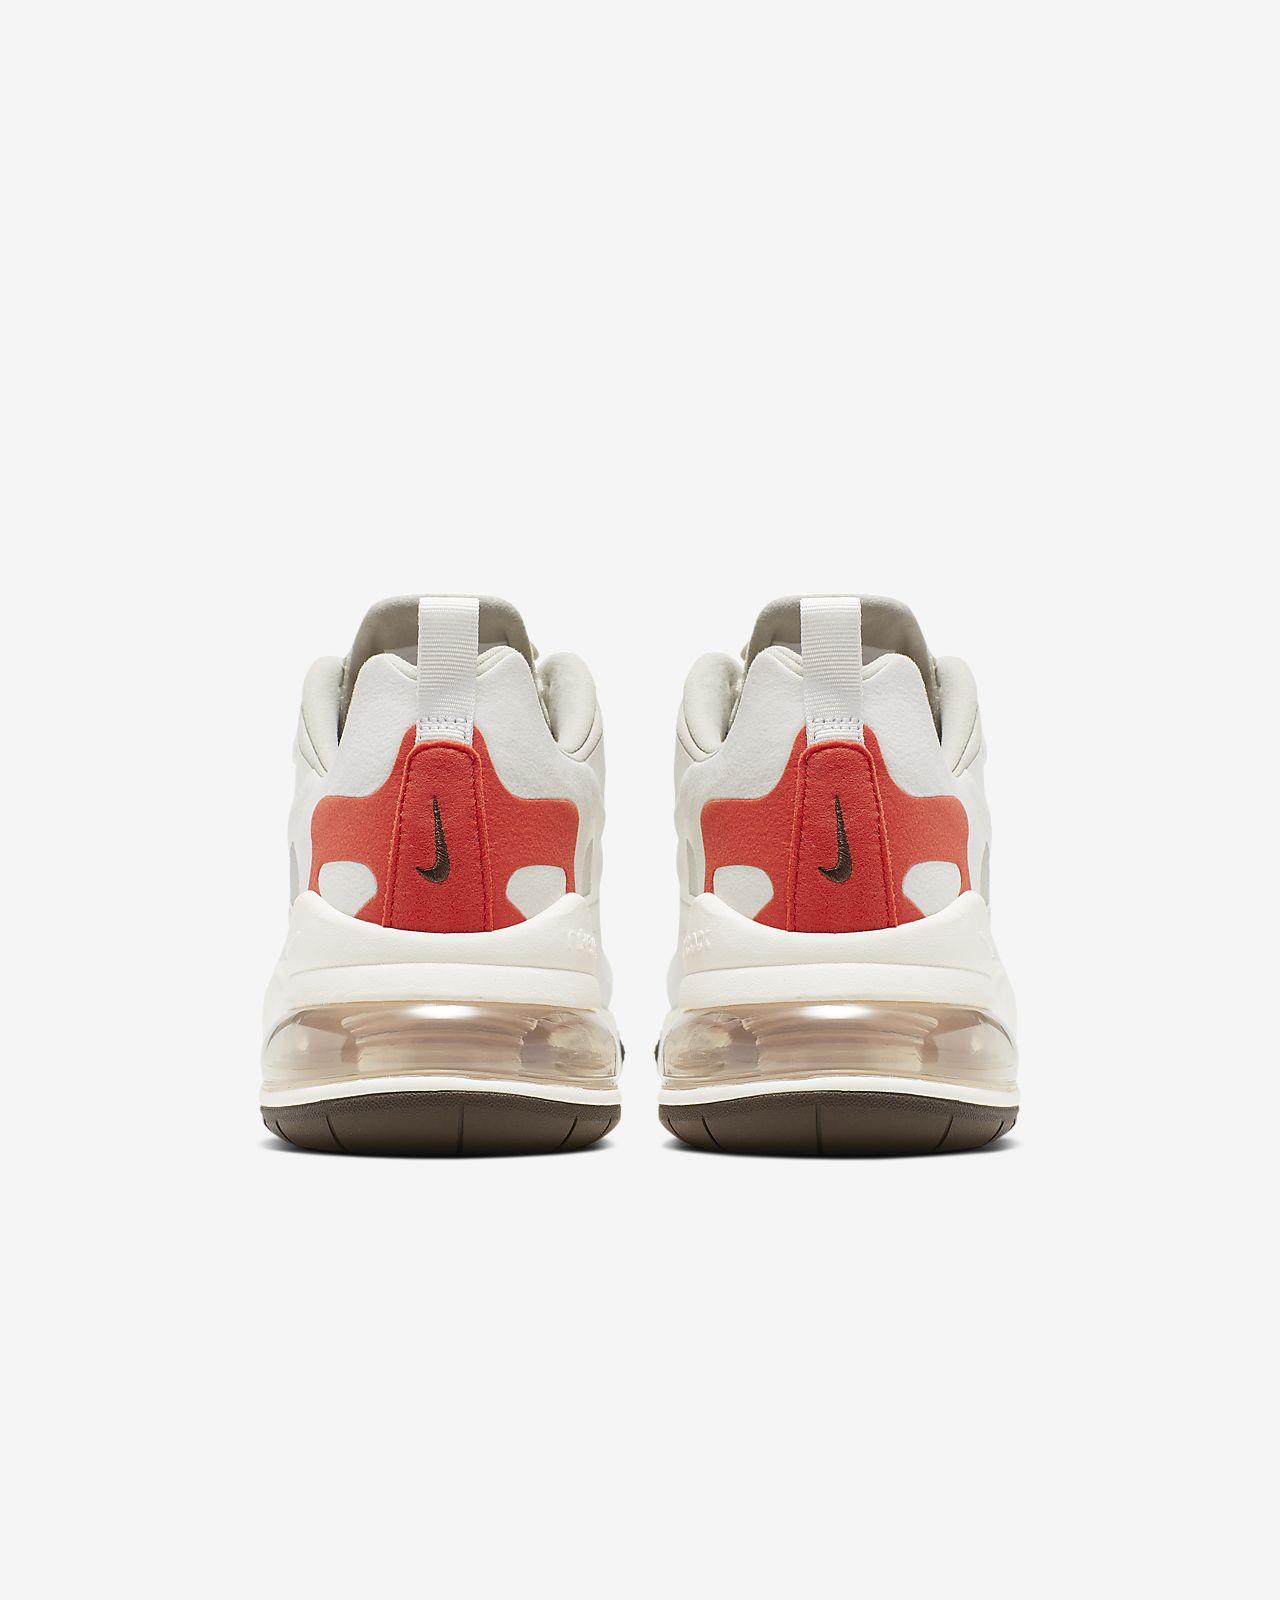 Nike Air Max 270 Herren Sportschuhe Mehrfarbig